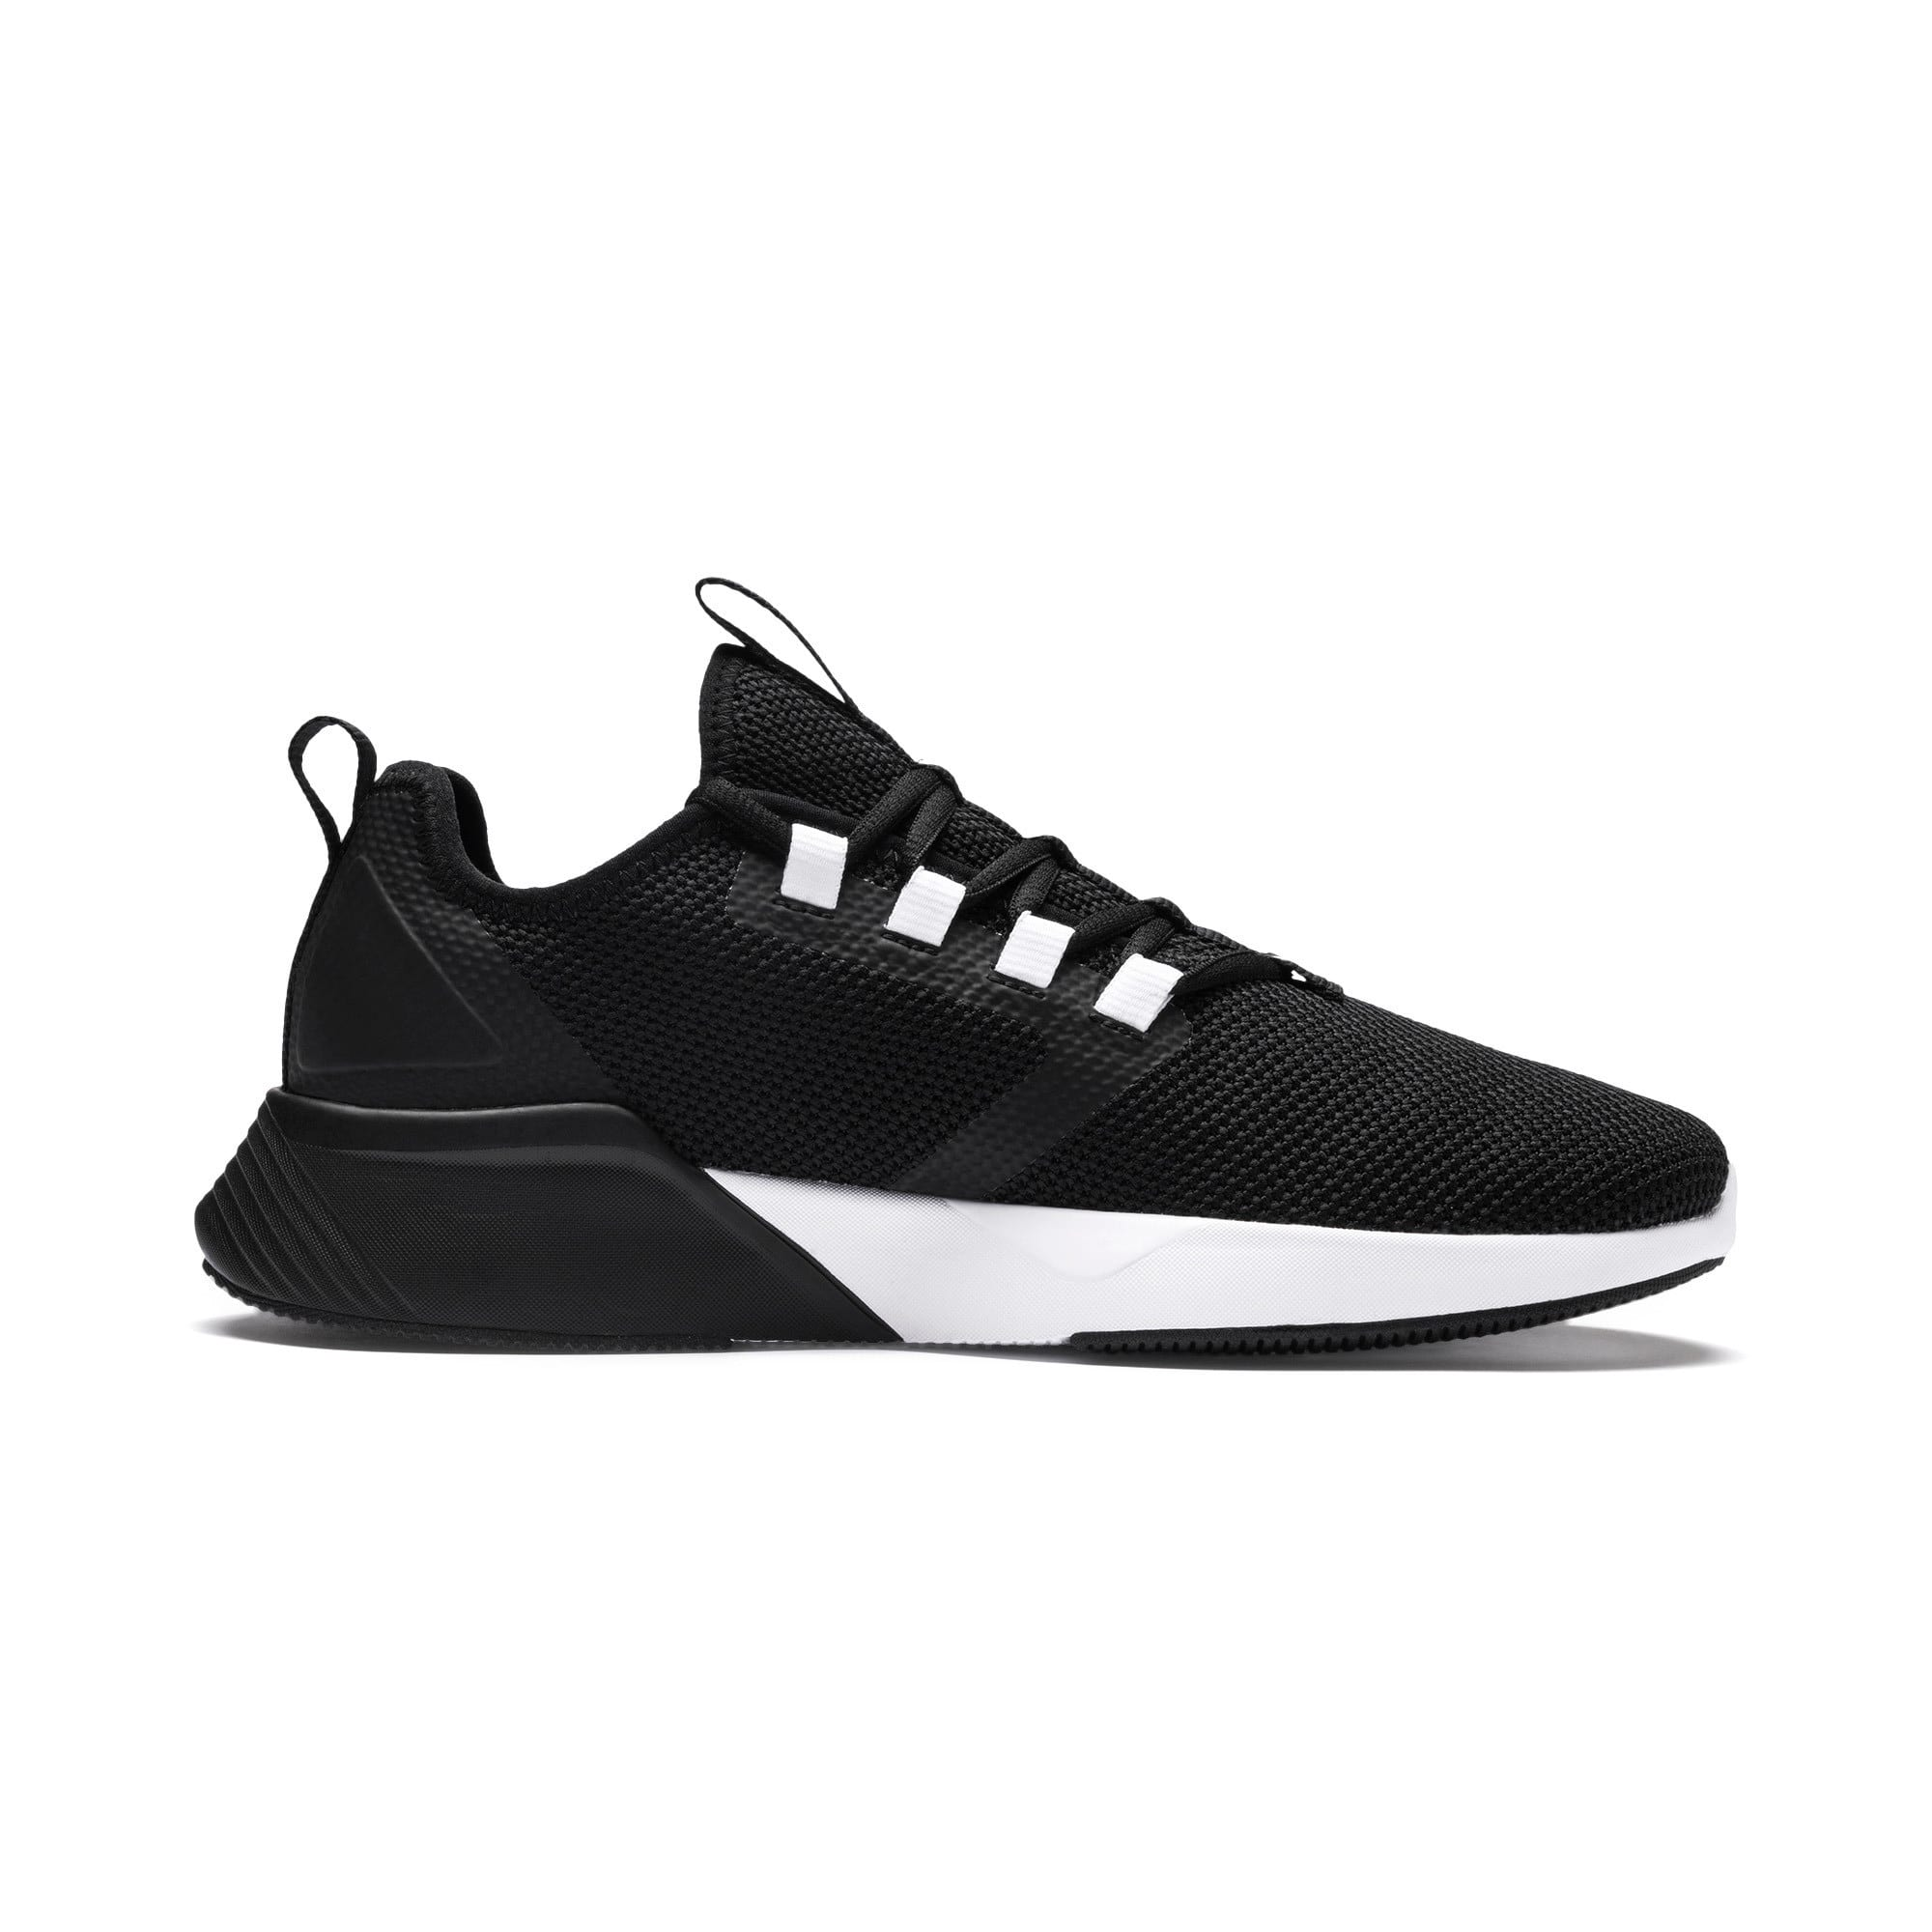 Thumbnail 5 of Retaliate Men's Training Shoes, Puma Black-Puma White, medium